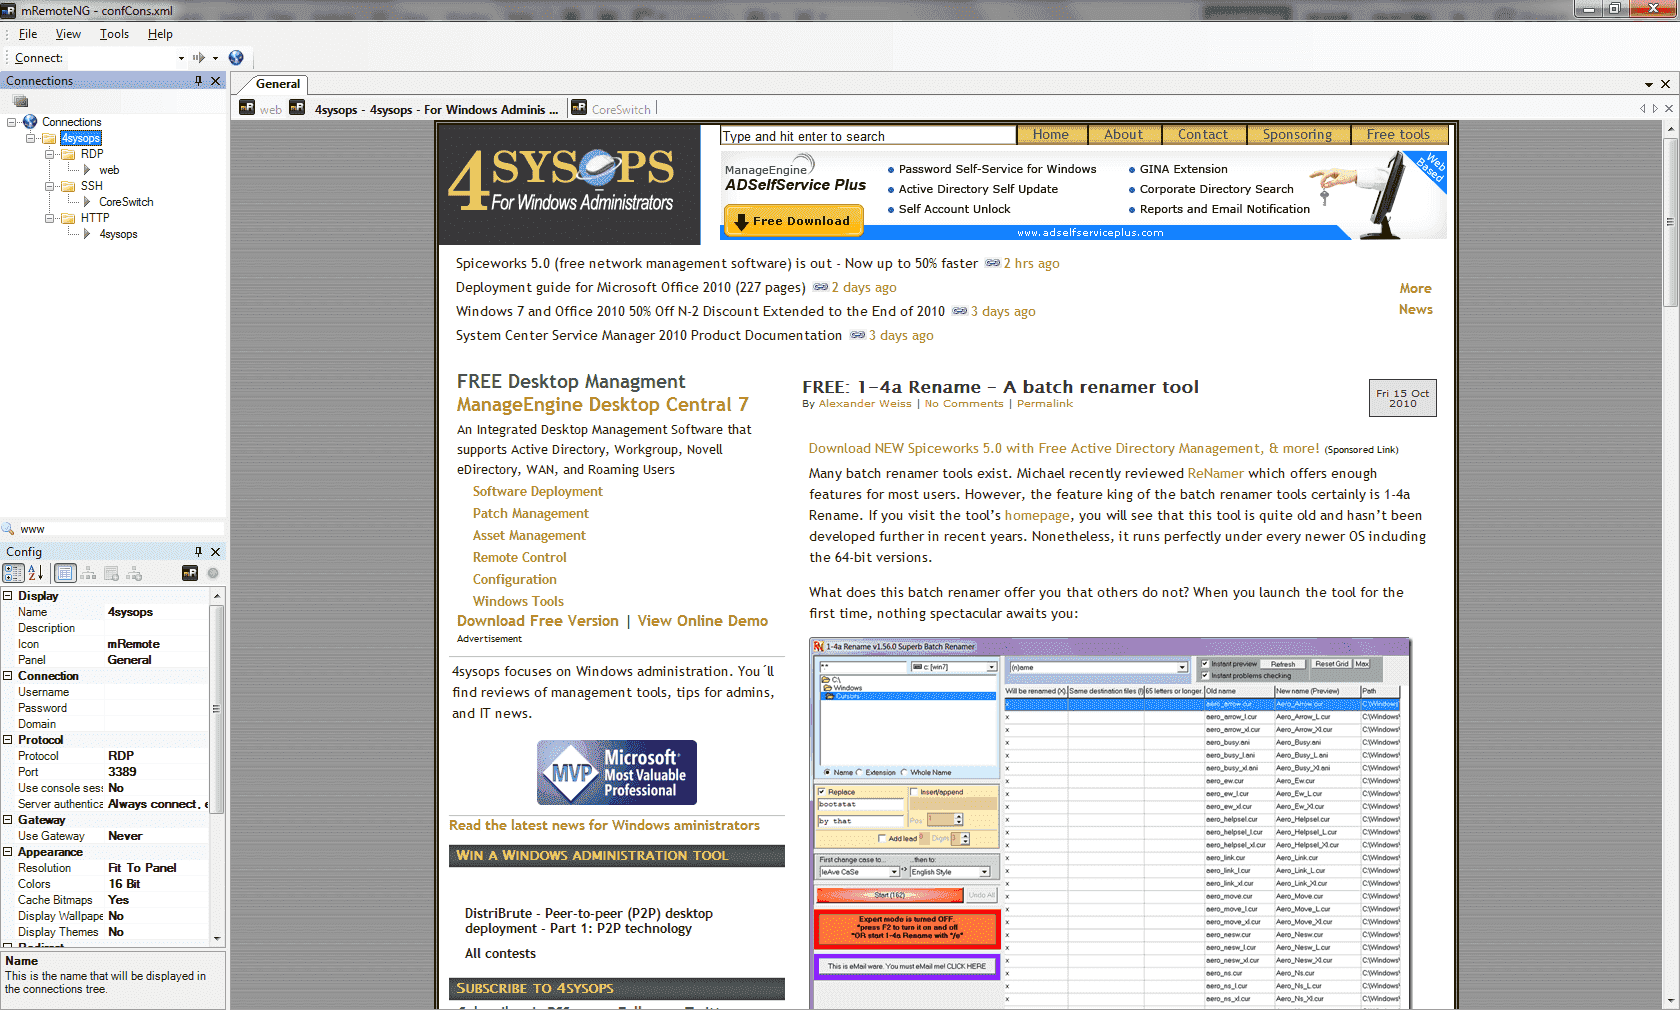 FREE: mRemoteNG – Open source, multi-protocol, remote connection